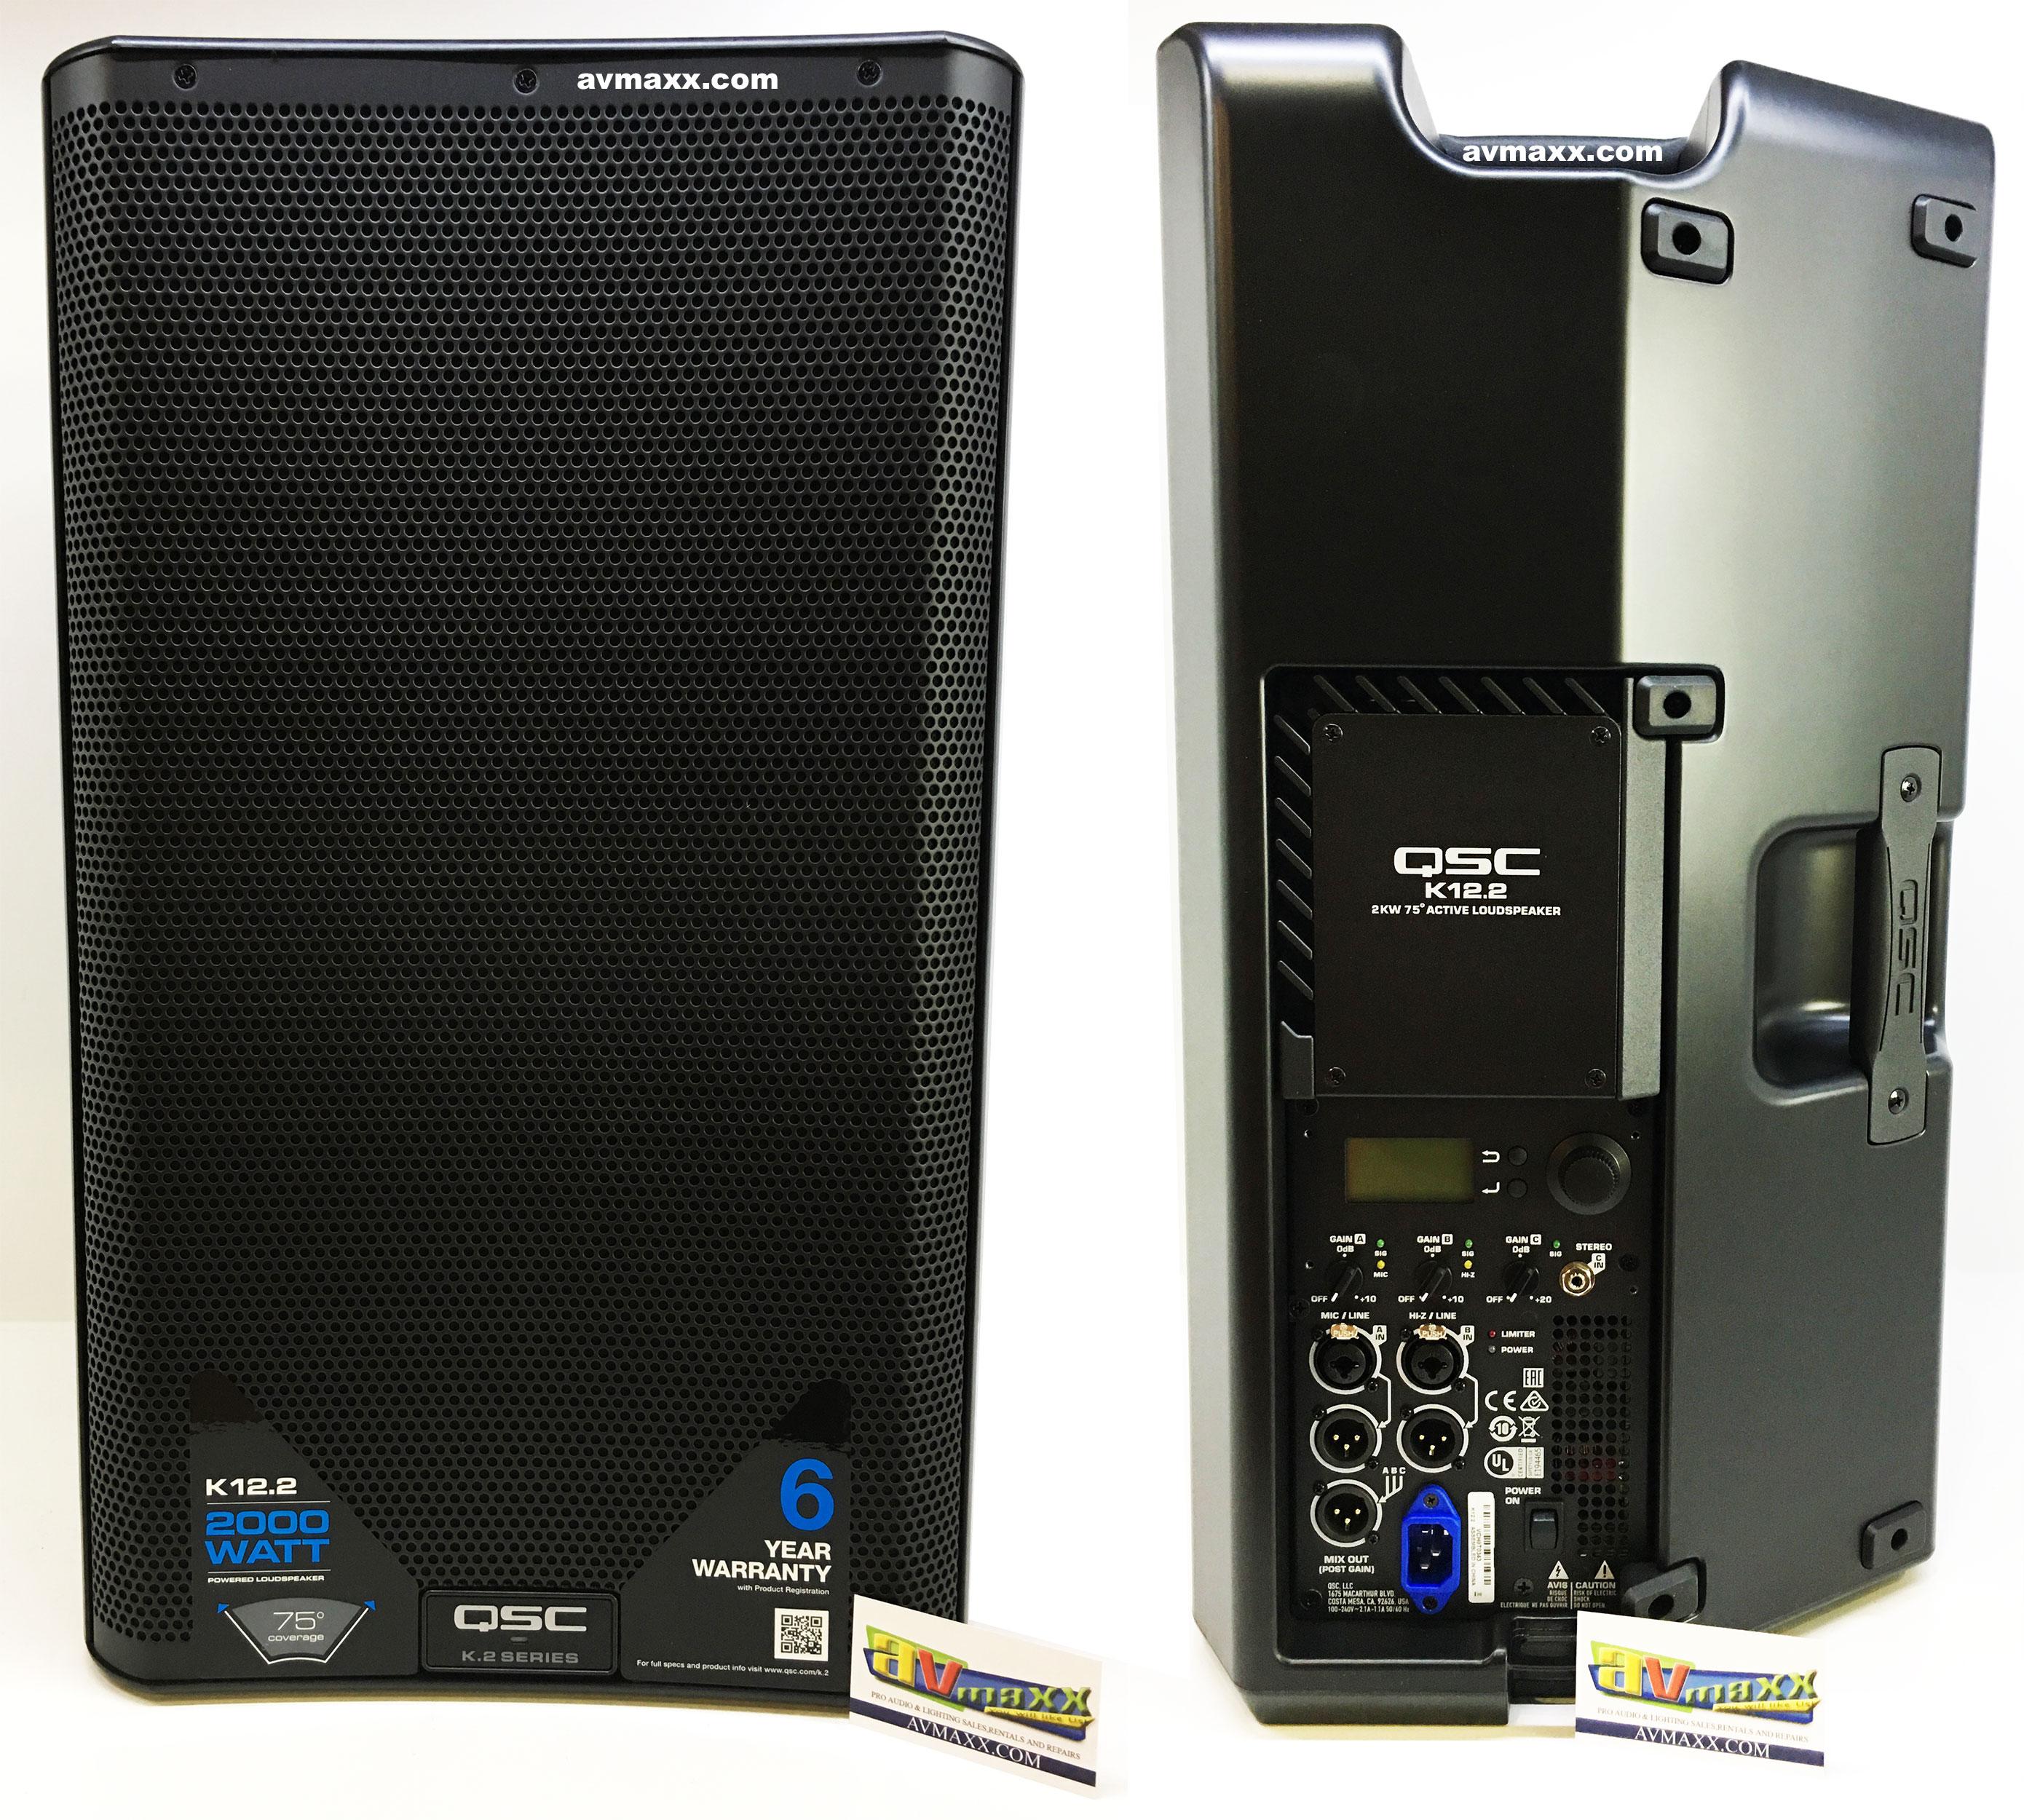 Qsc K12 Review : qsc k12 2 package deal 12 2000w active speaker bundle ~ Vivirlamusica.com Haus und Dekorationen